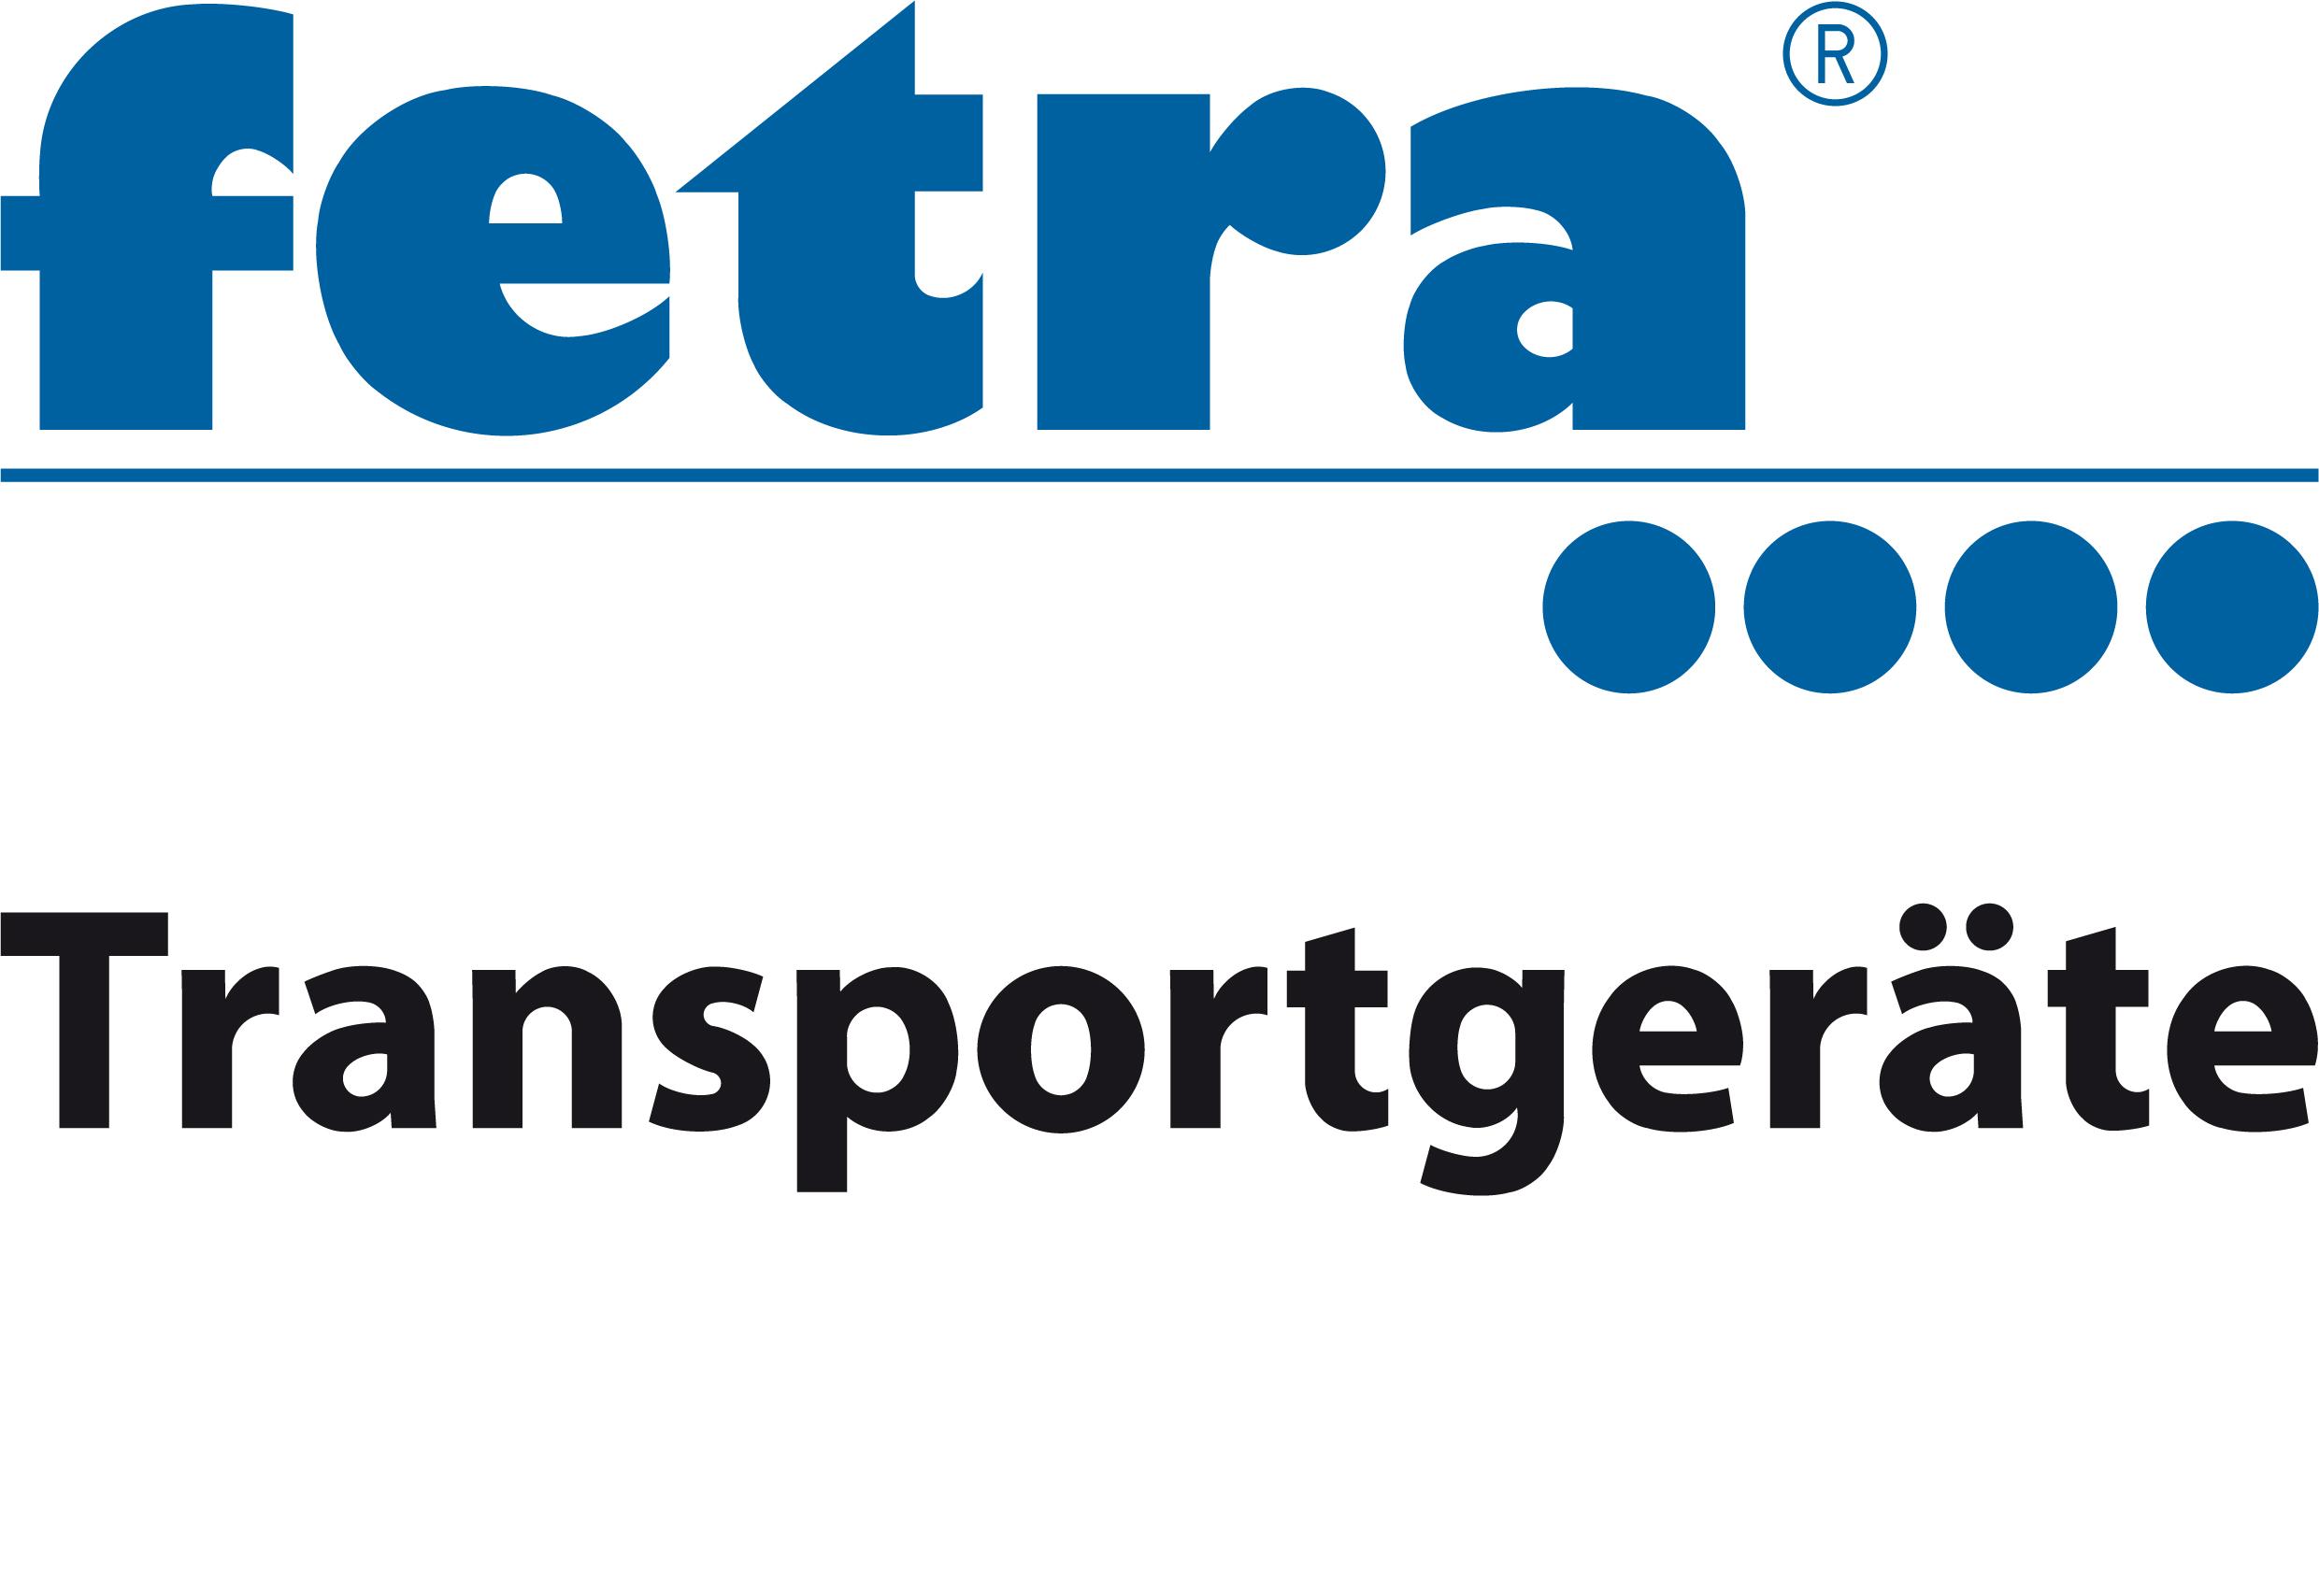 Fetra_LogoVector_Claim_RGB-1